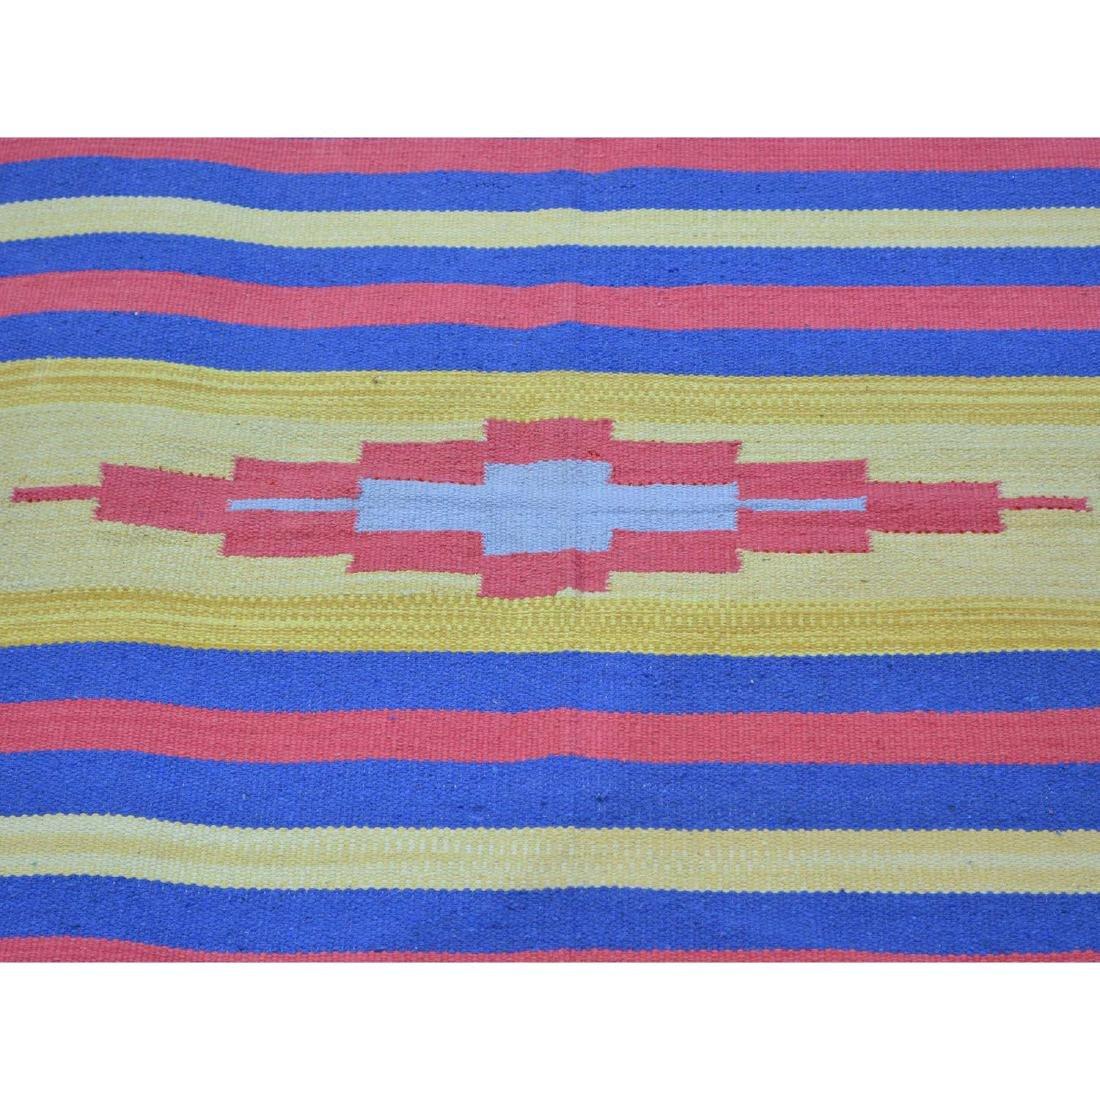 Square Navajo Design Flat Weave Hand Woven Killim Rug - 4